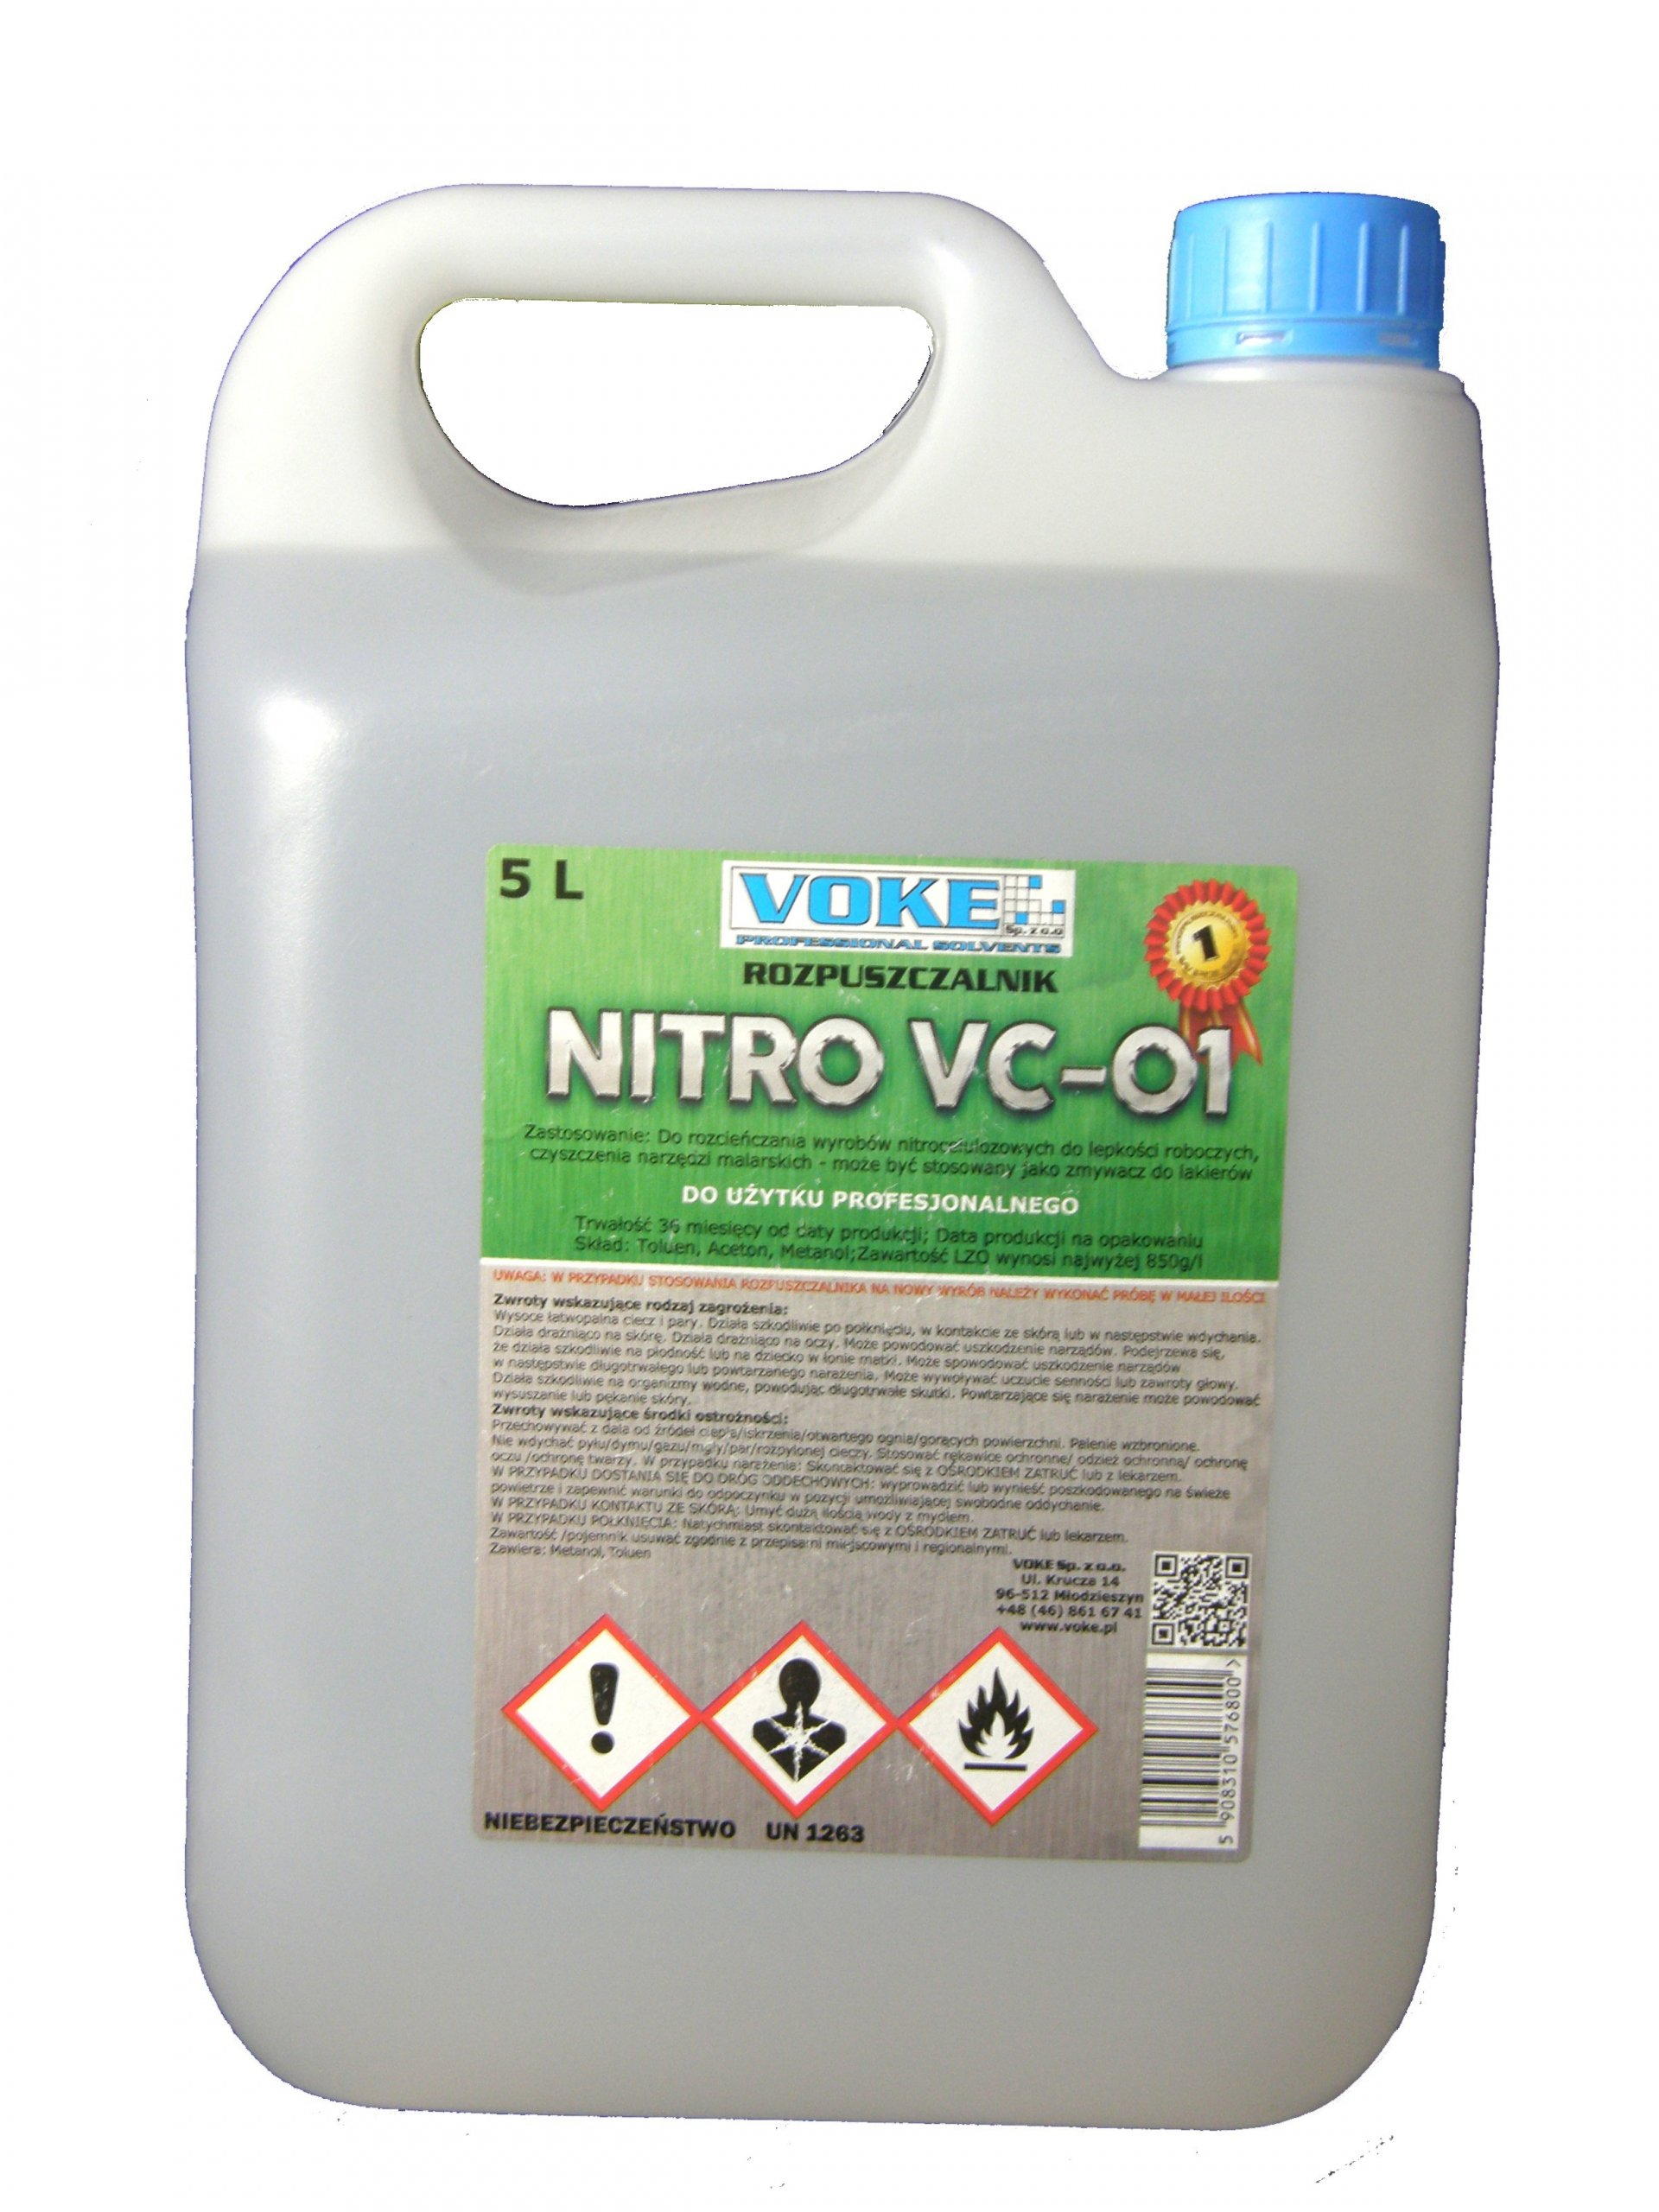 Растворитель Нитро 5Л VC-01 VOKE